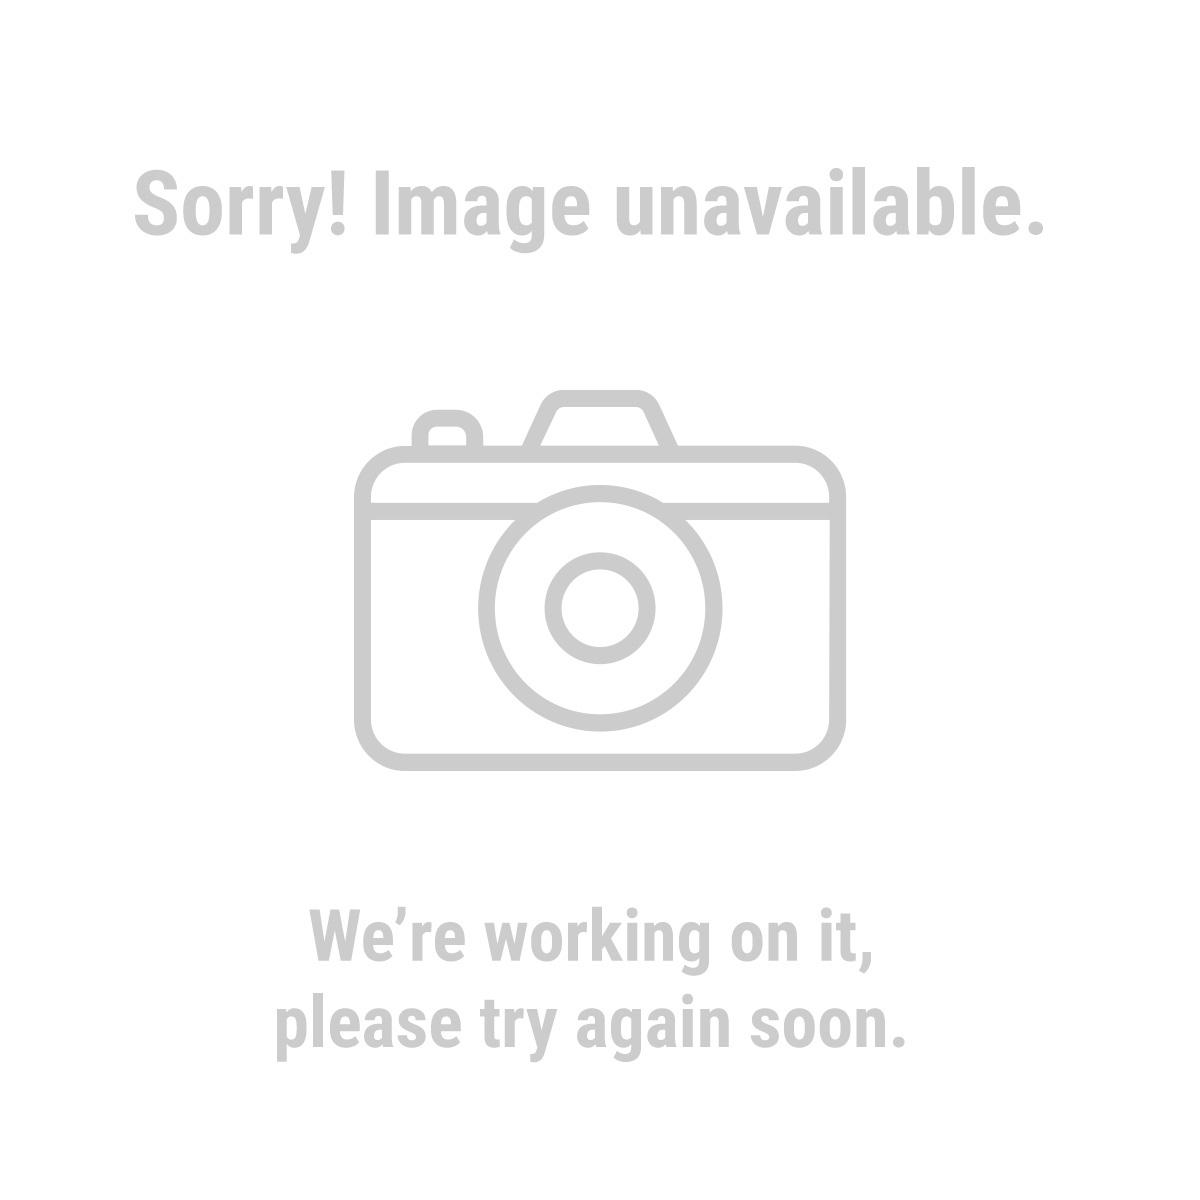 Drill Master 62871 18 Volt Cordless Jig Saw